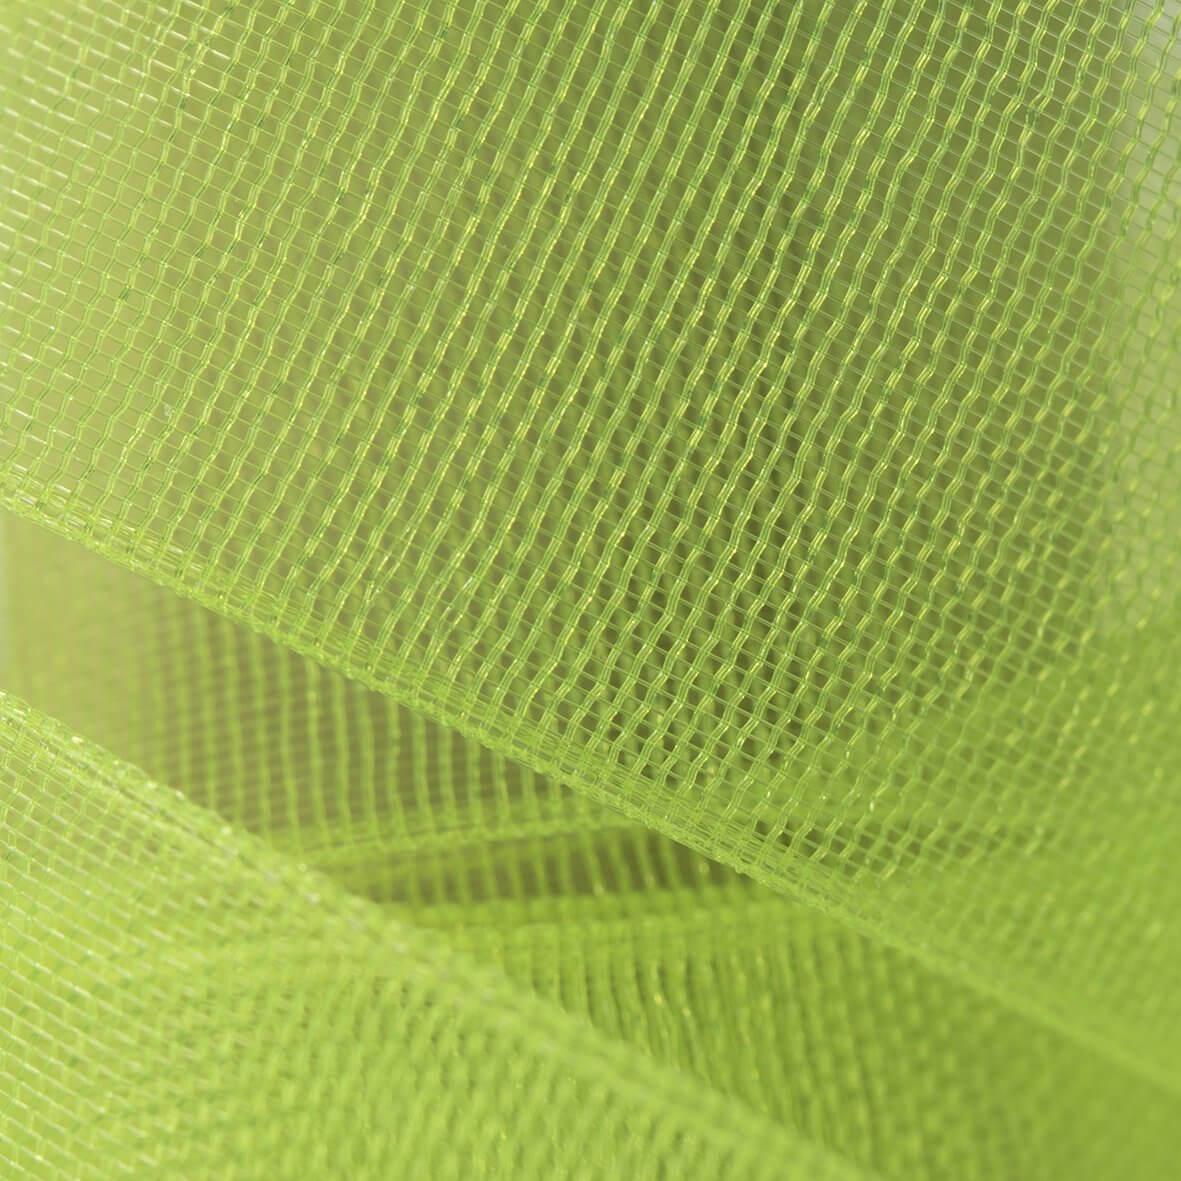 Apple Green Organza Ribbon 38mm from Club Green - Swatch